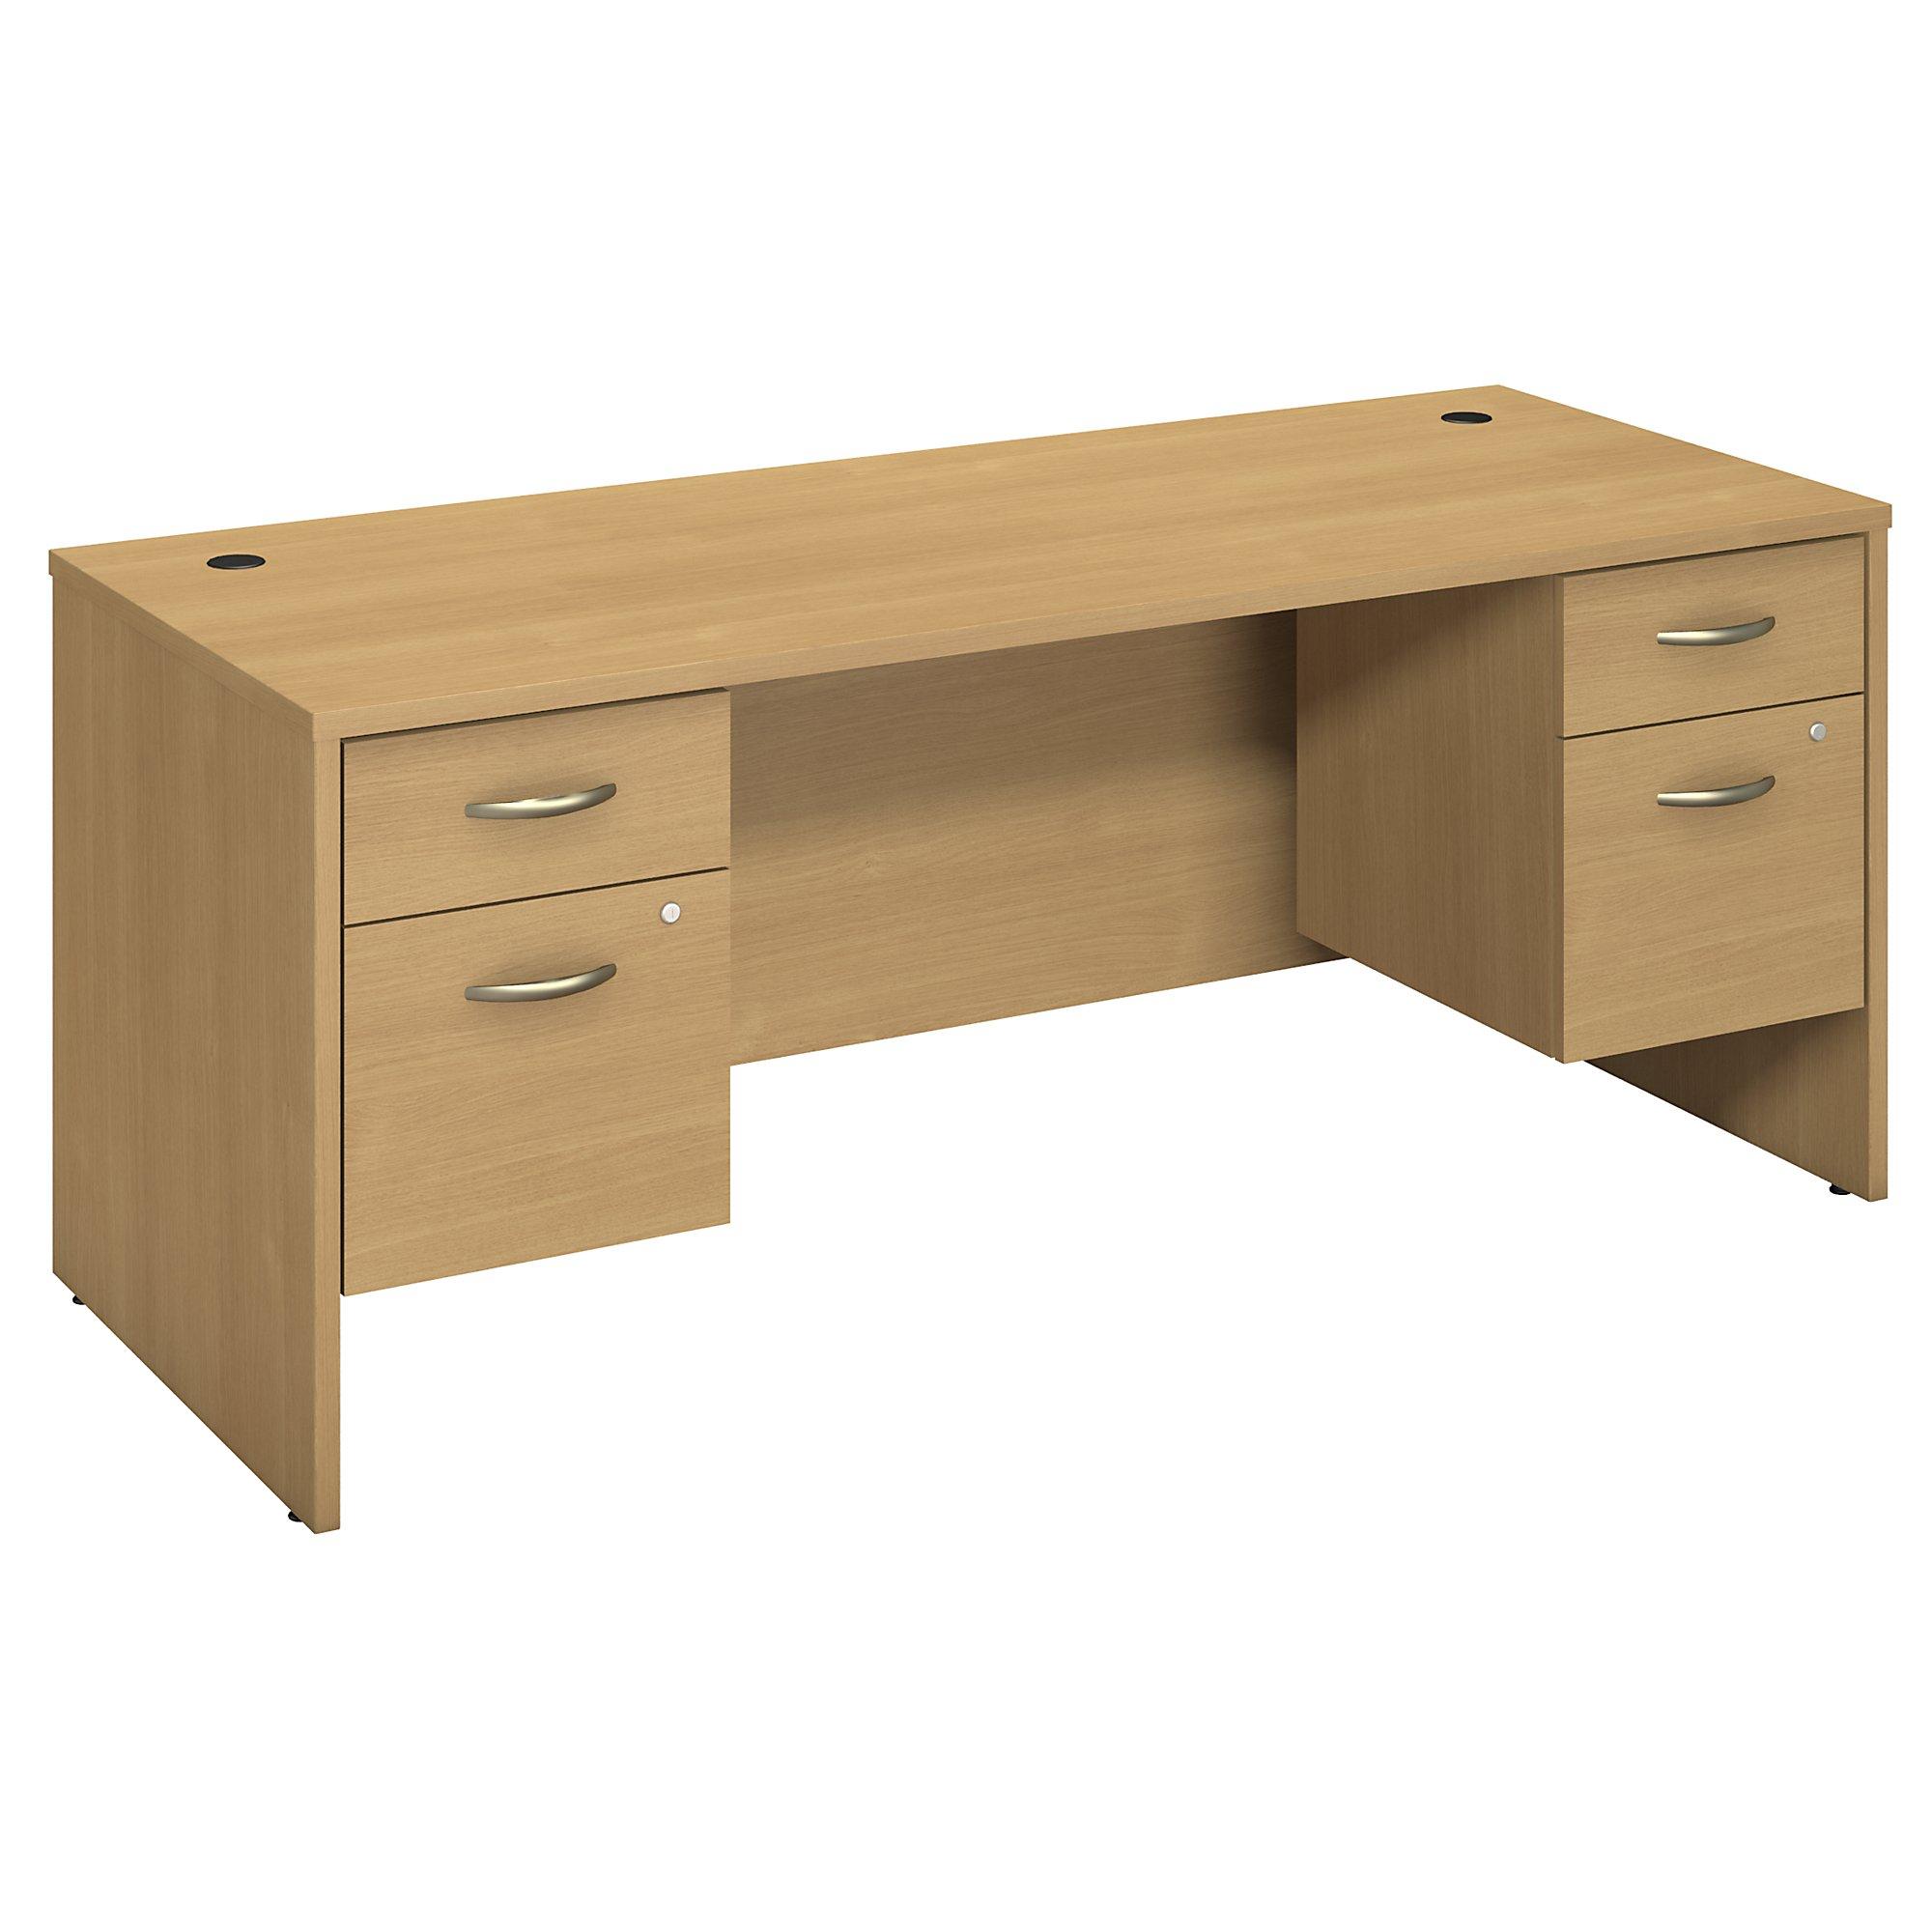 light oak series c 72w desk with pedestals